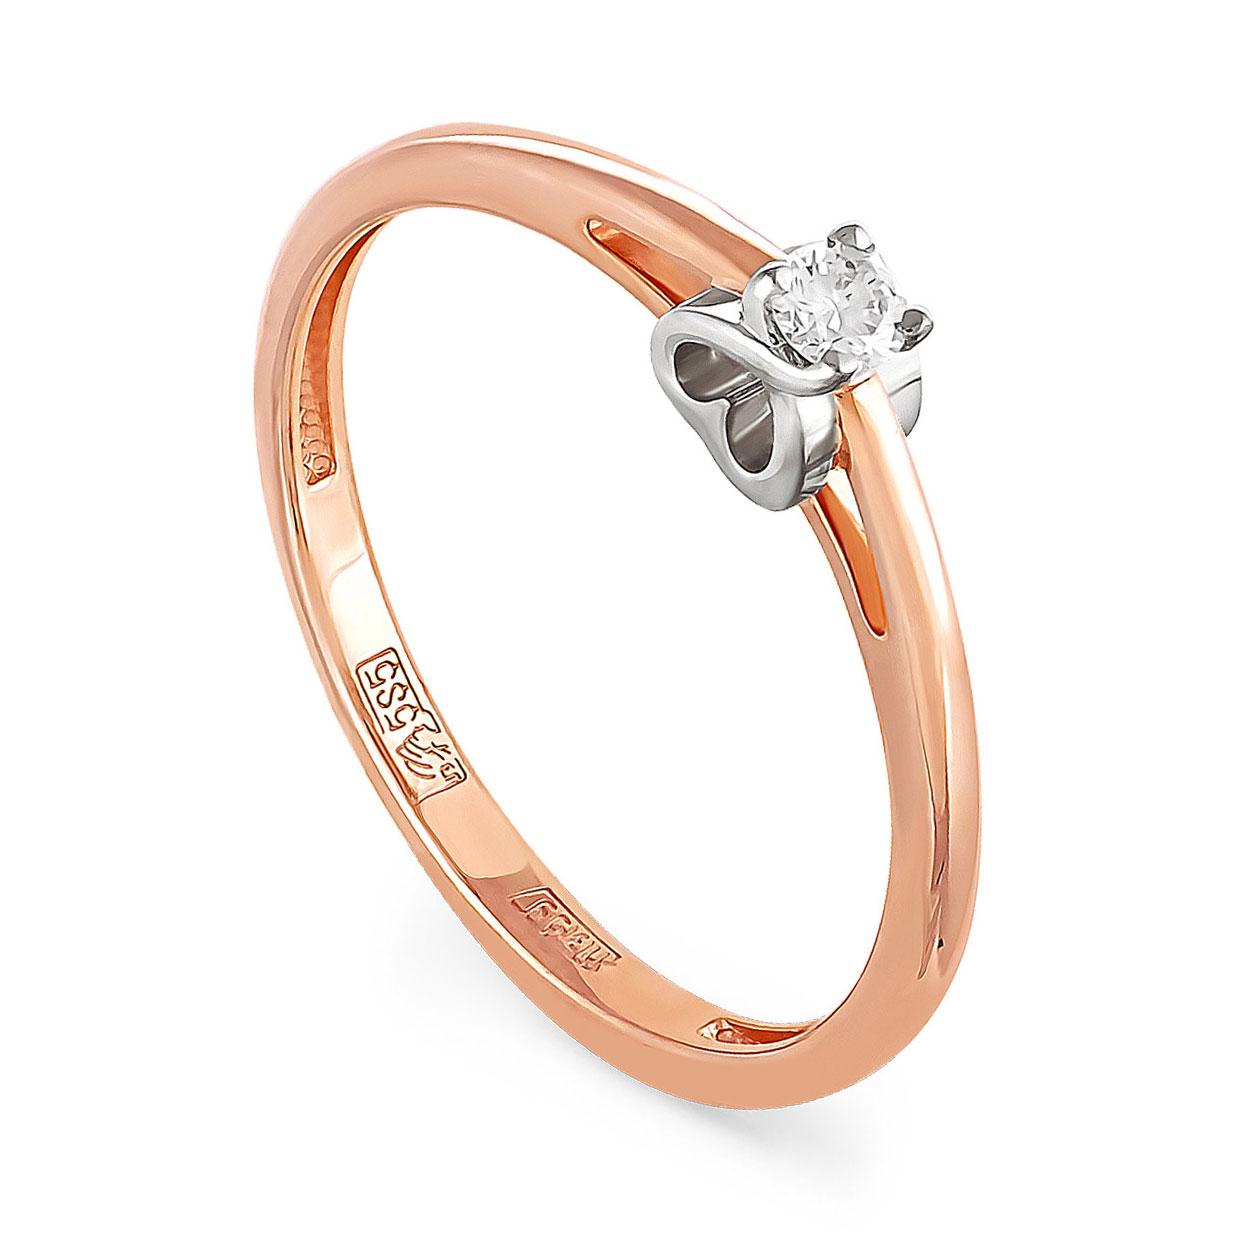 Золотое кольцо Бриллиант арт. 1-0172-1000 1-0172-1000